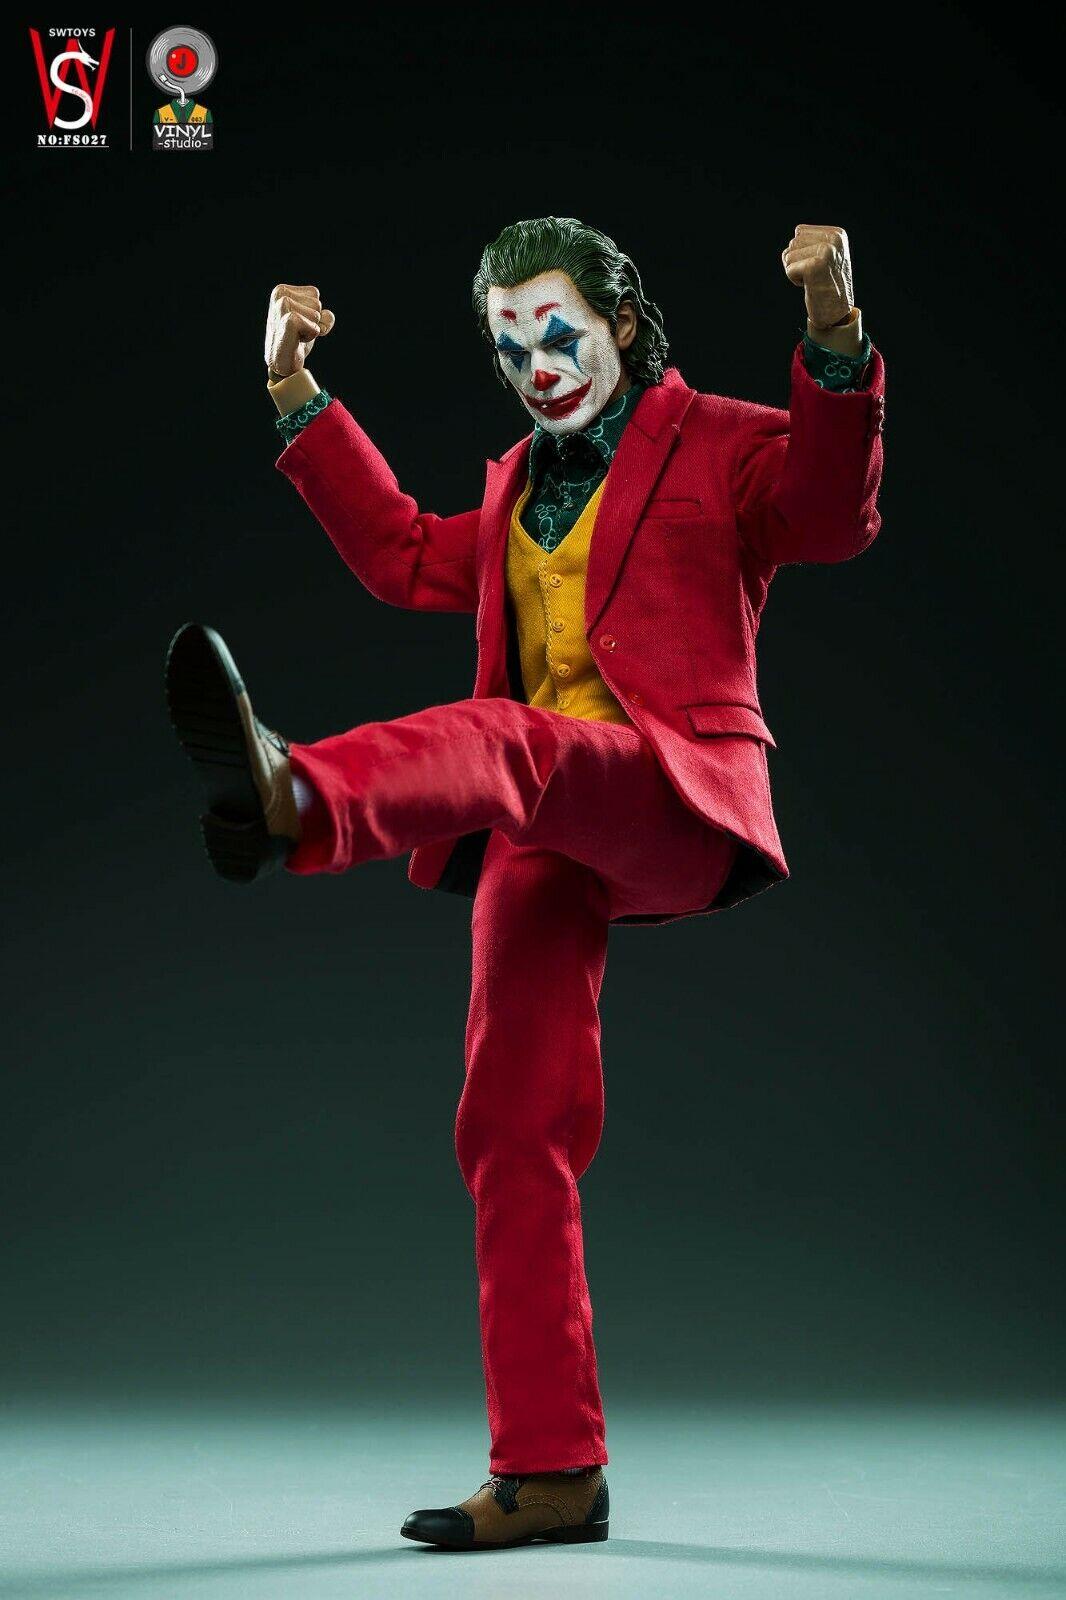 SWTOYS FS027 1//6 Joker Clown Joaquin Accessories Figure Set Studio-v003 VINYL